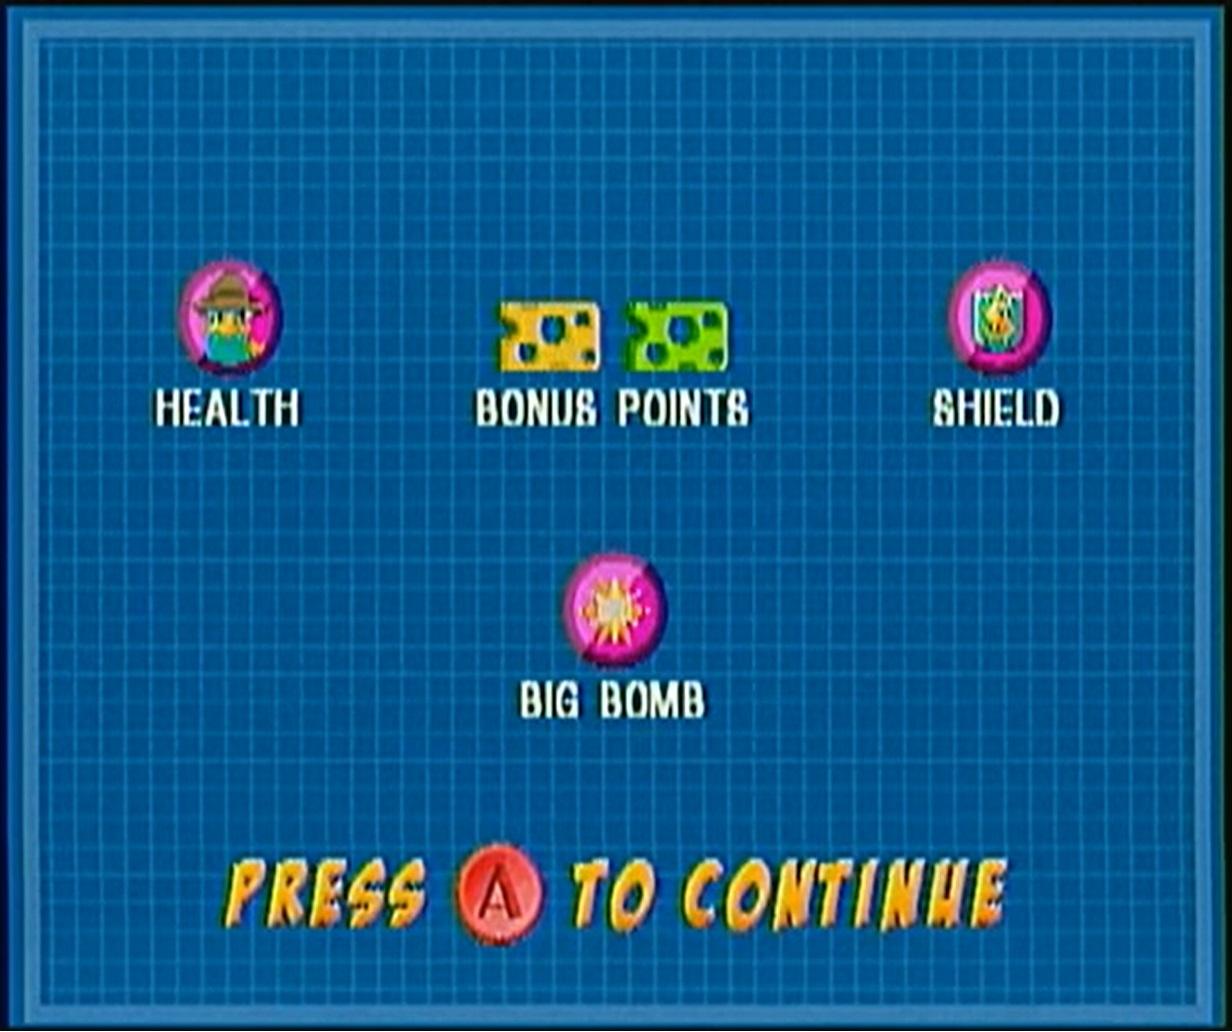 File:Best Game Ever! - Blimp Buster instructions 2.jpg